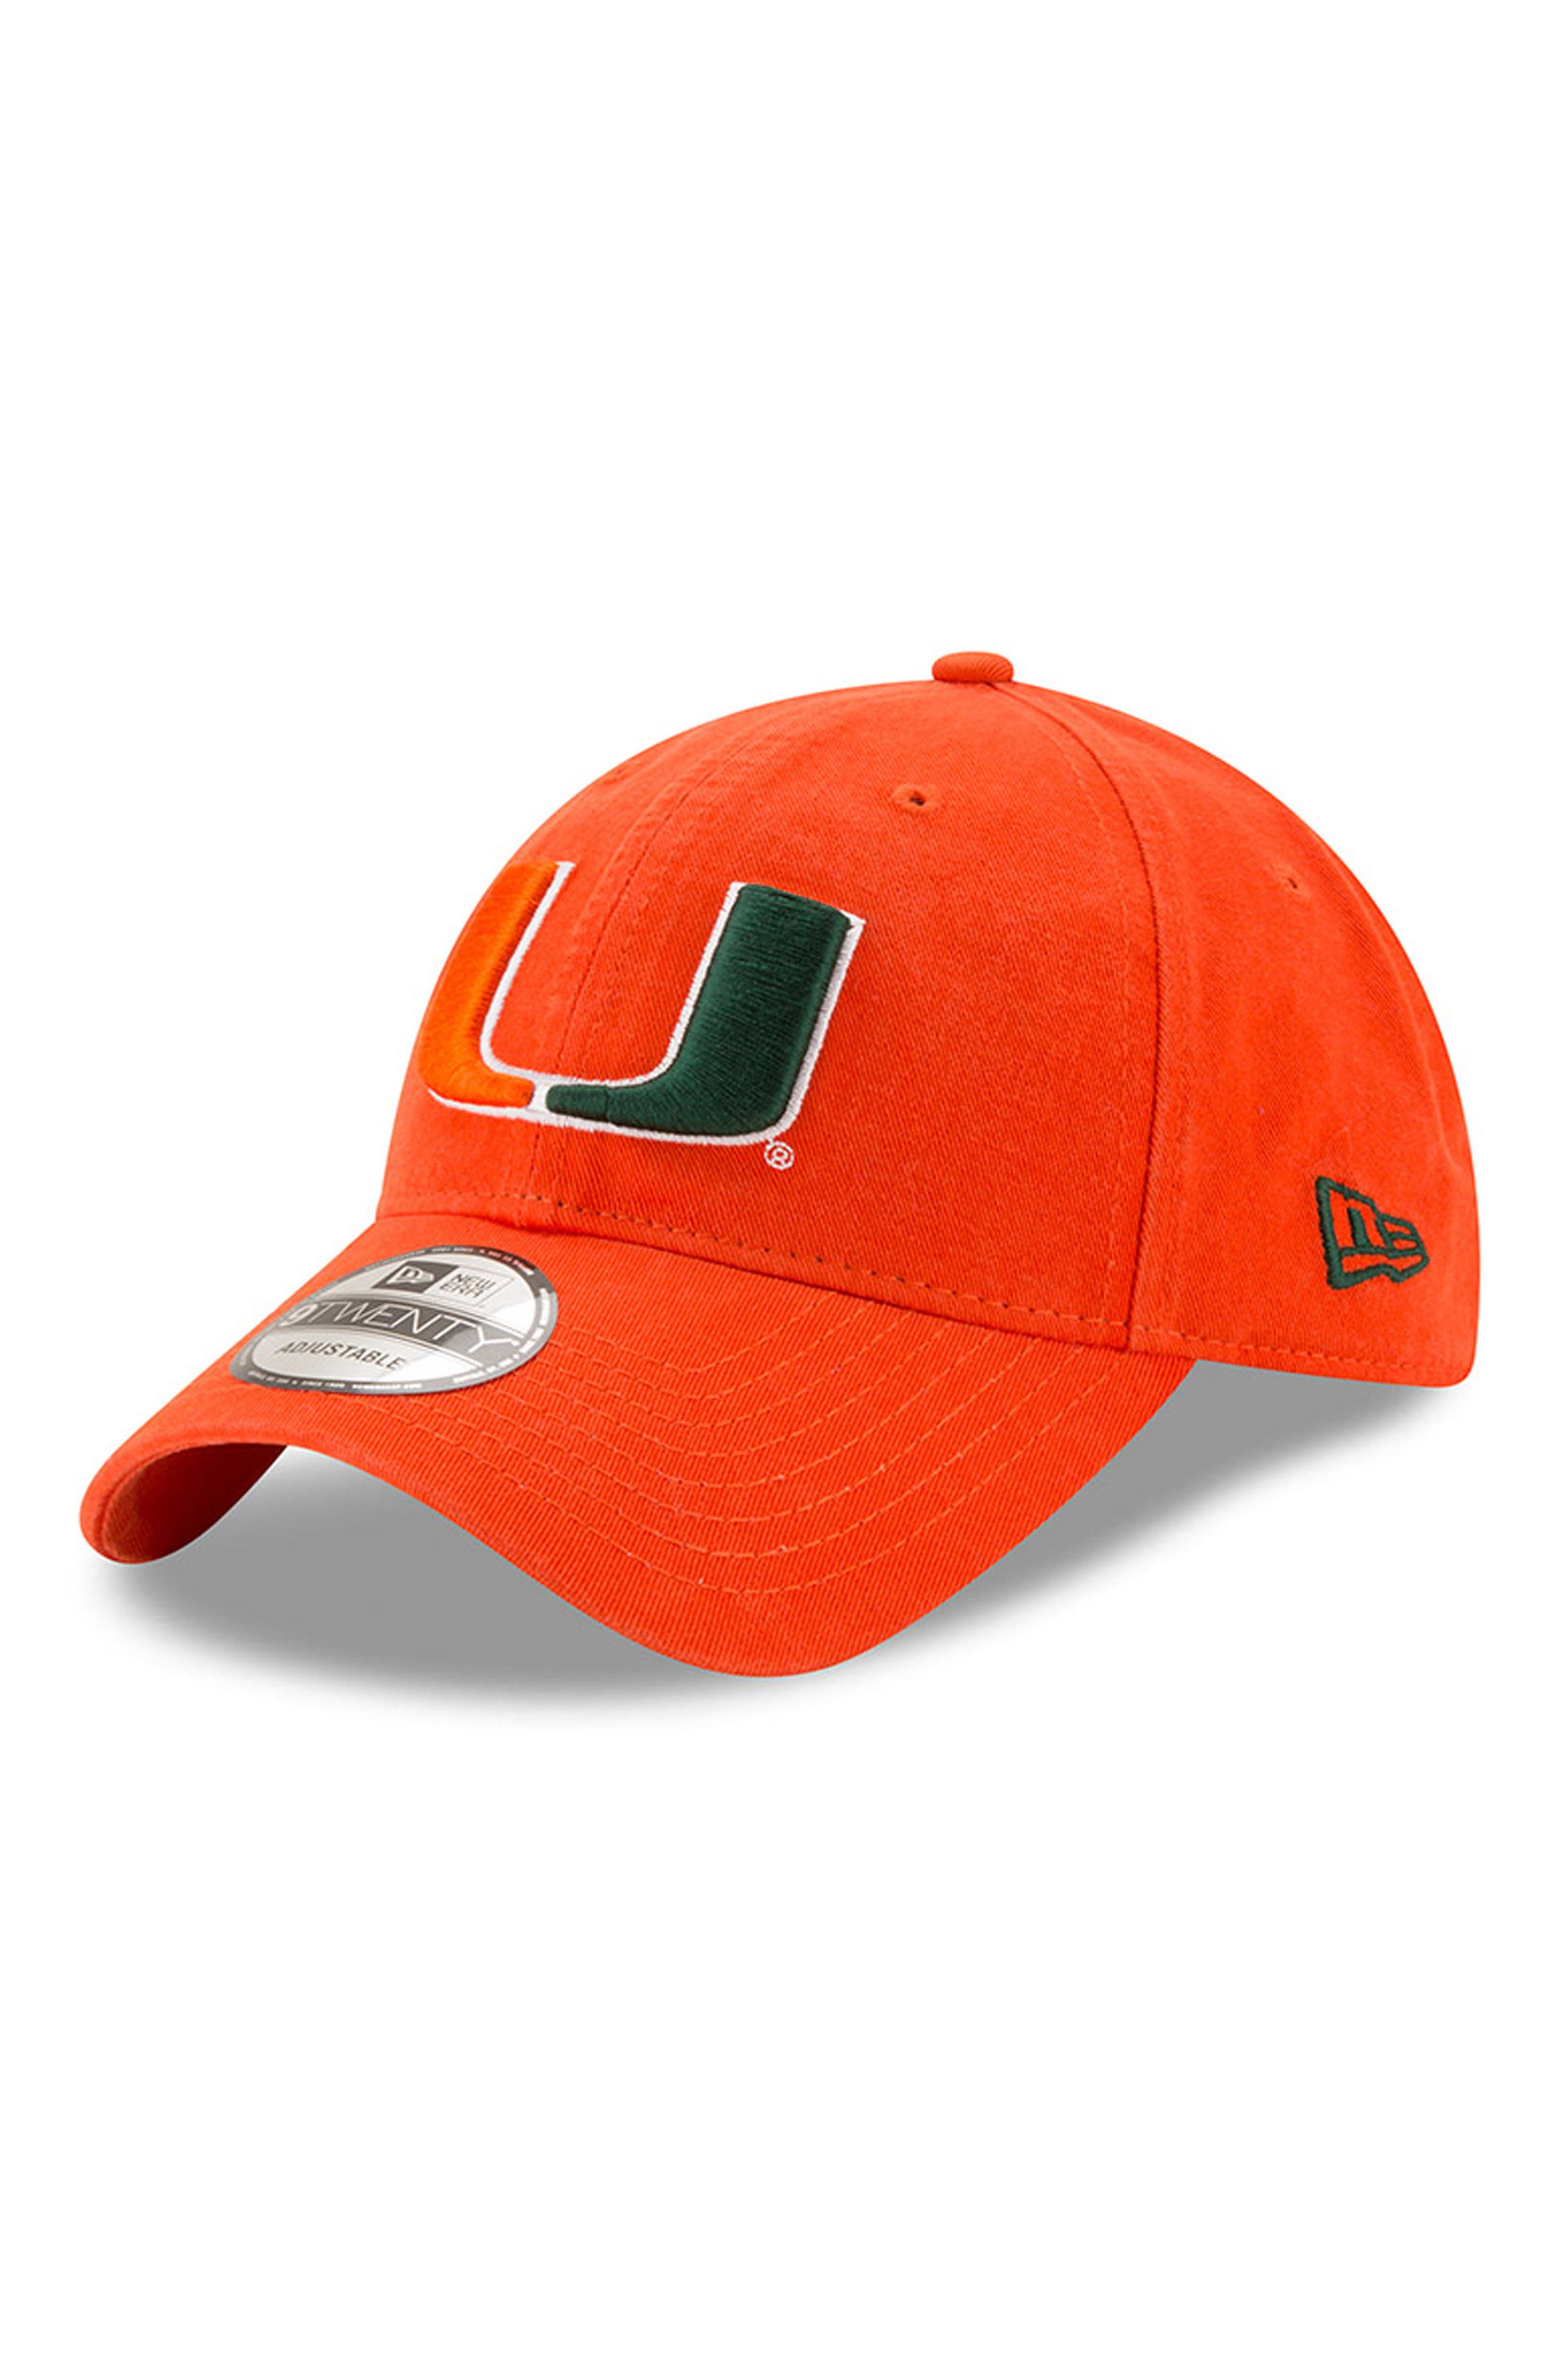 New Era Collegiate Core Classic - Miami Hurricanes Baseball Cap